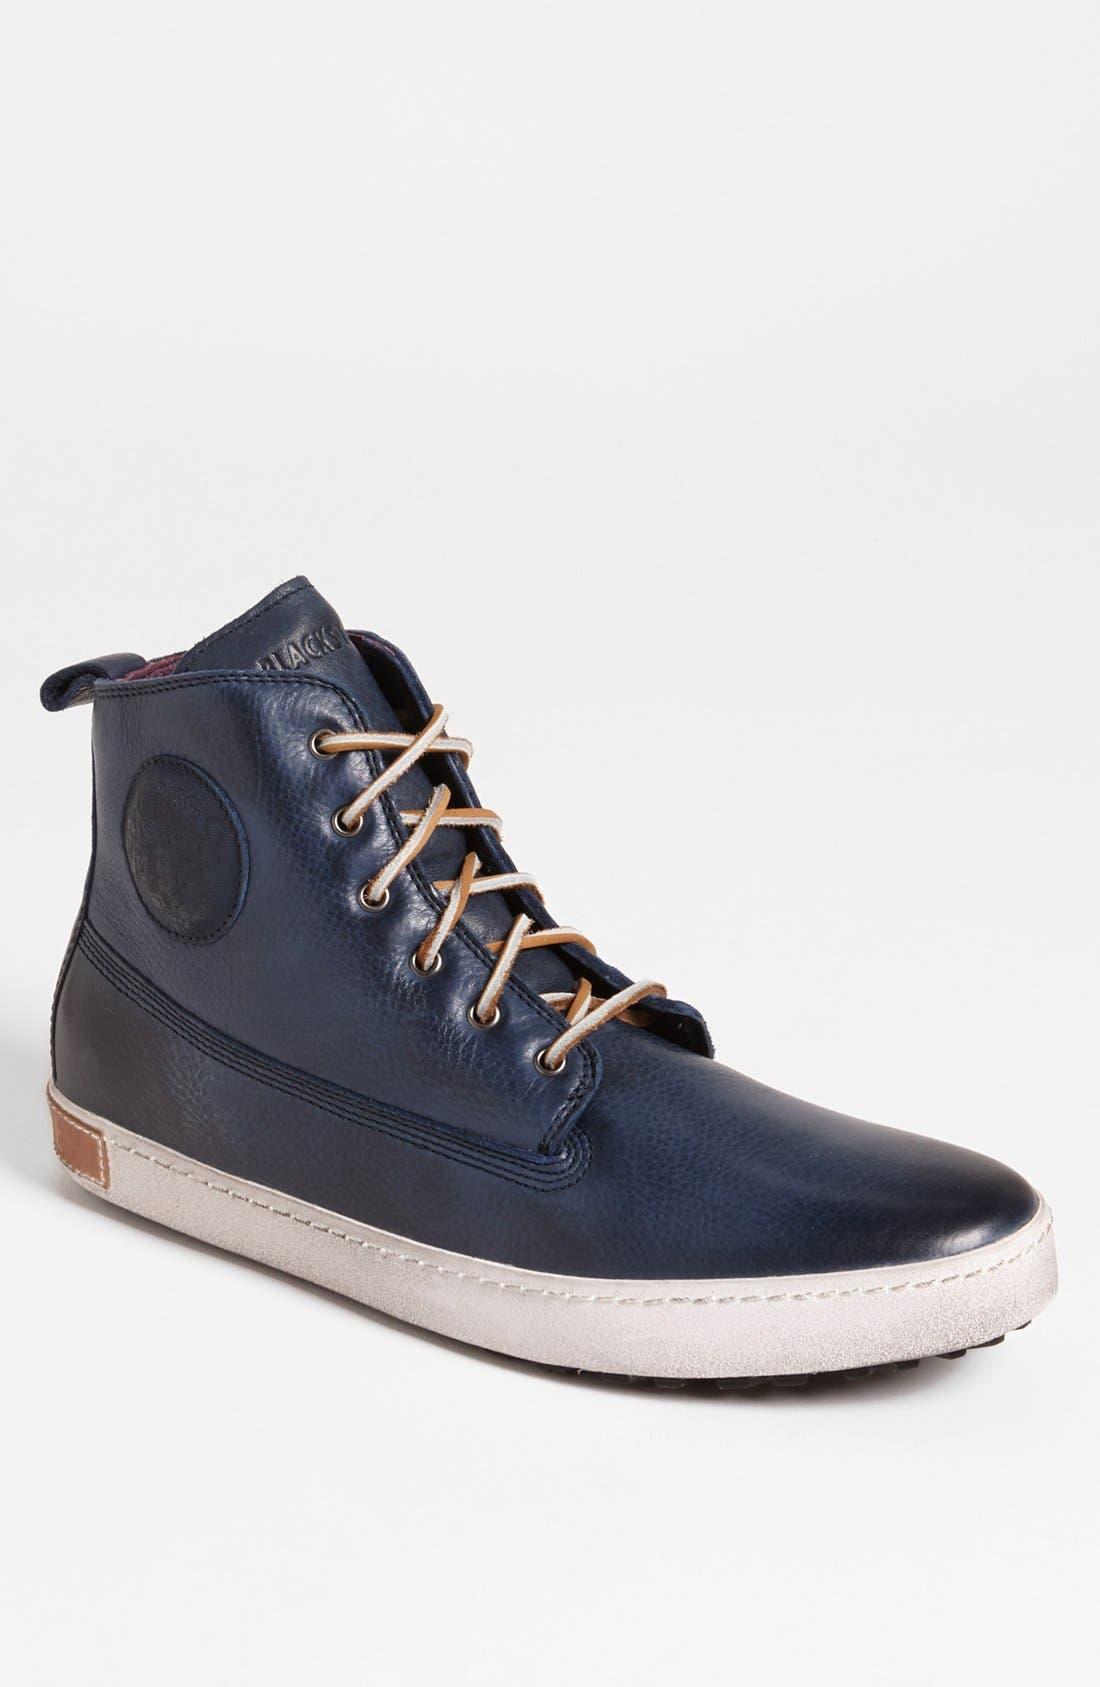 Alternate Image 1 Selected - Blackstone 'AM 02' High Top Sneaker